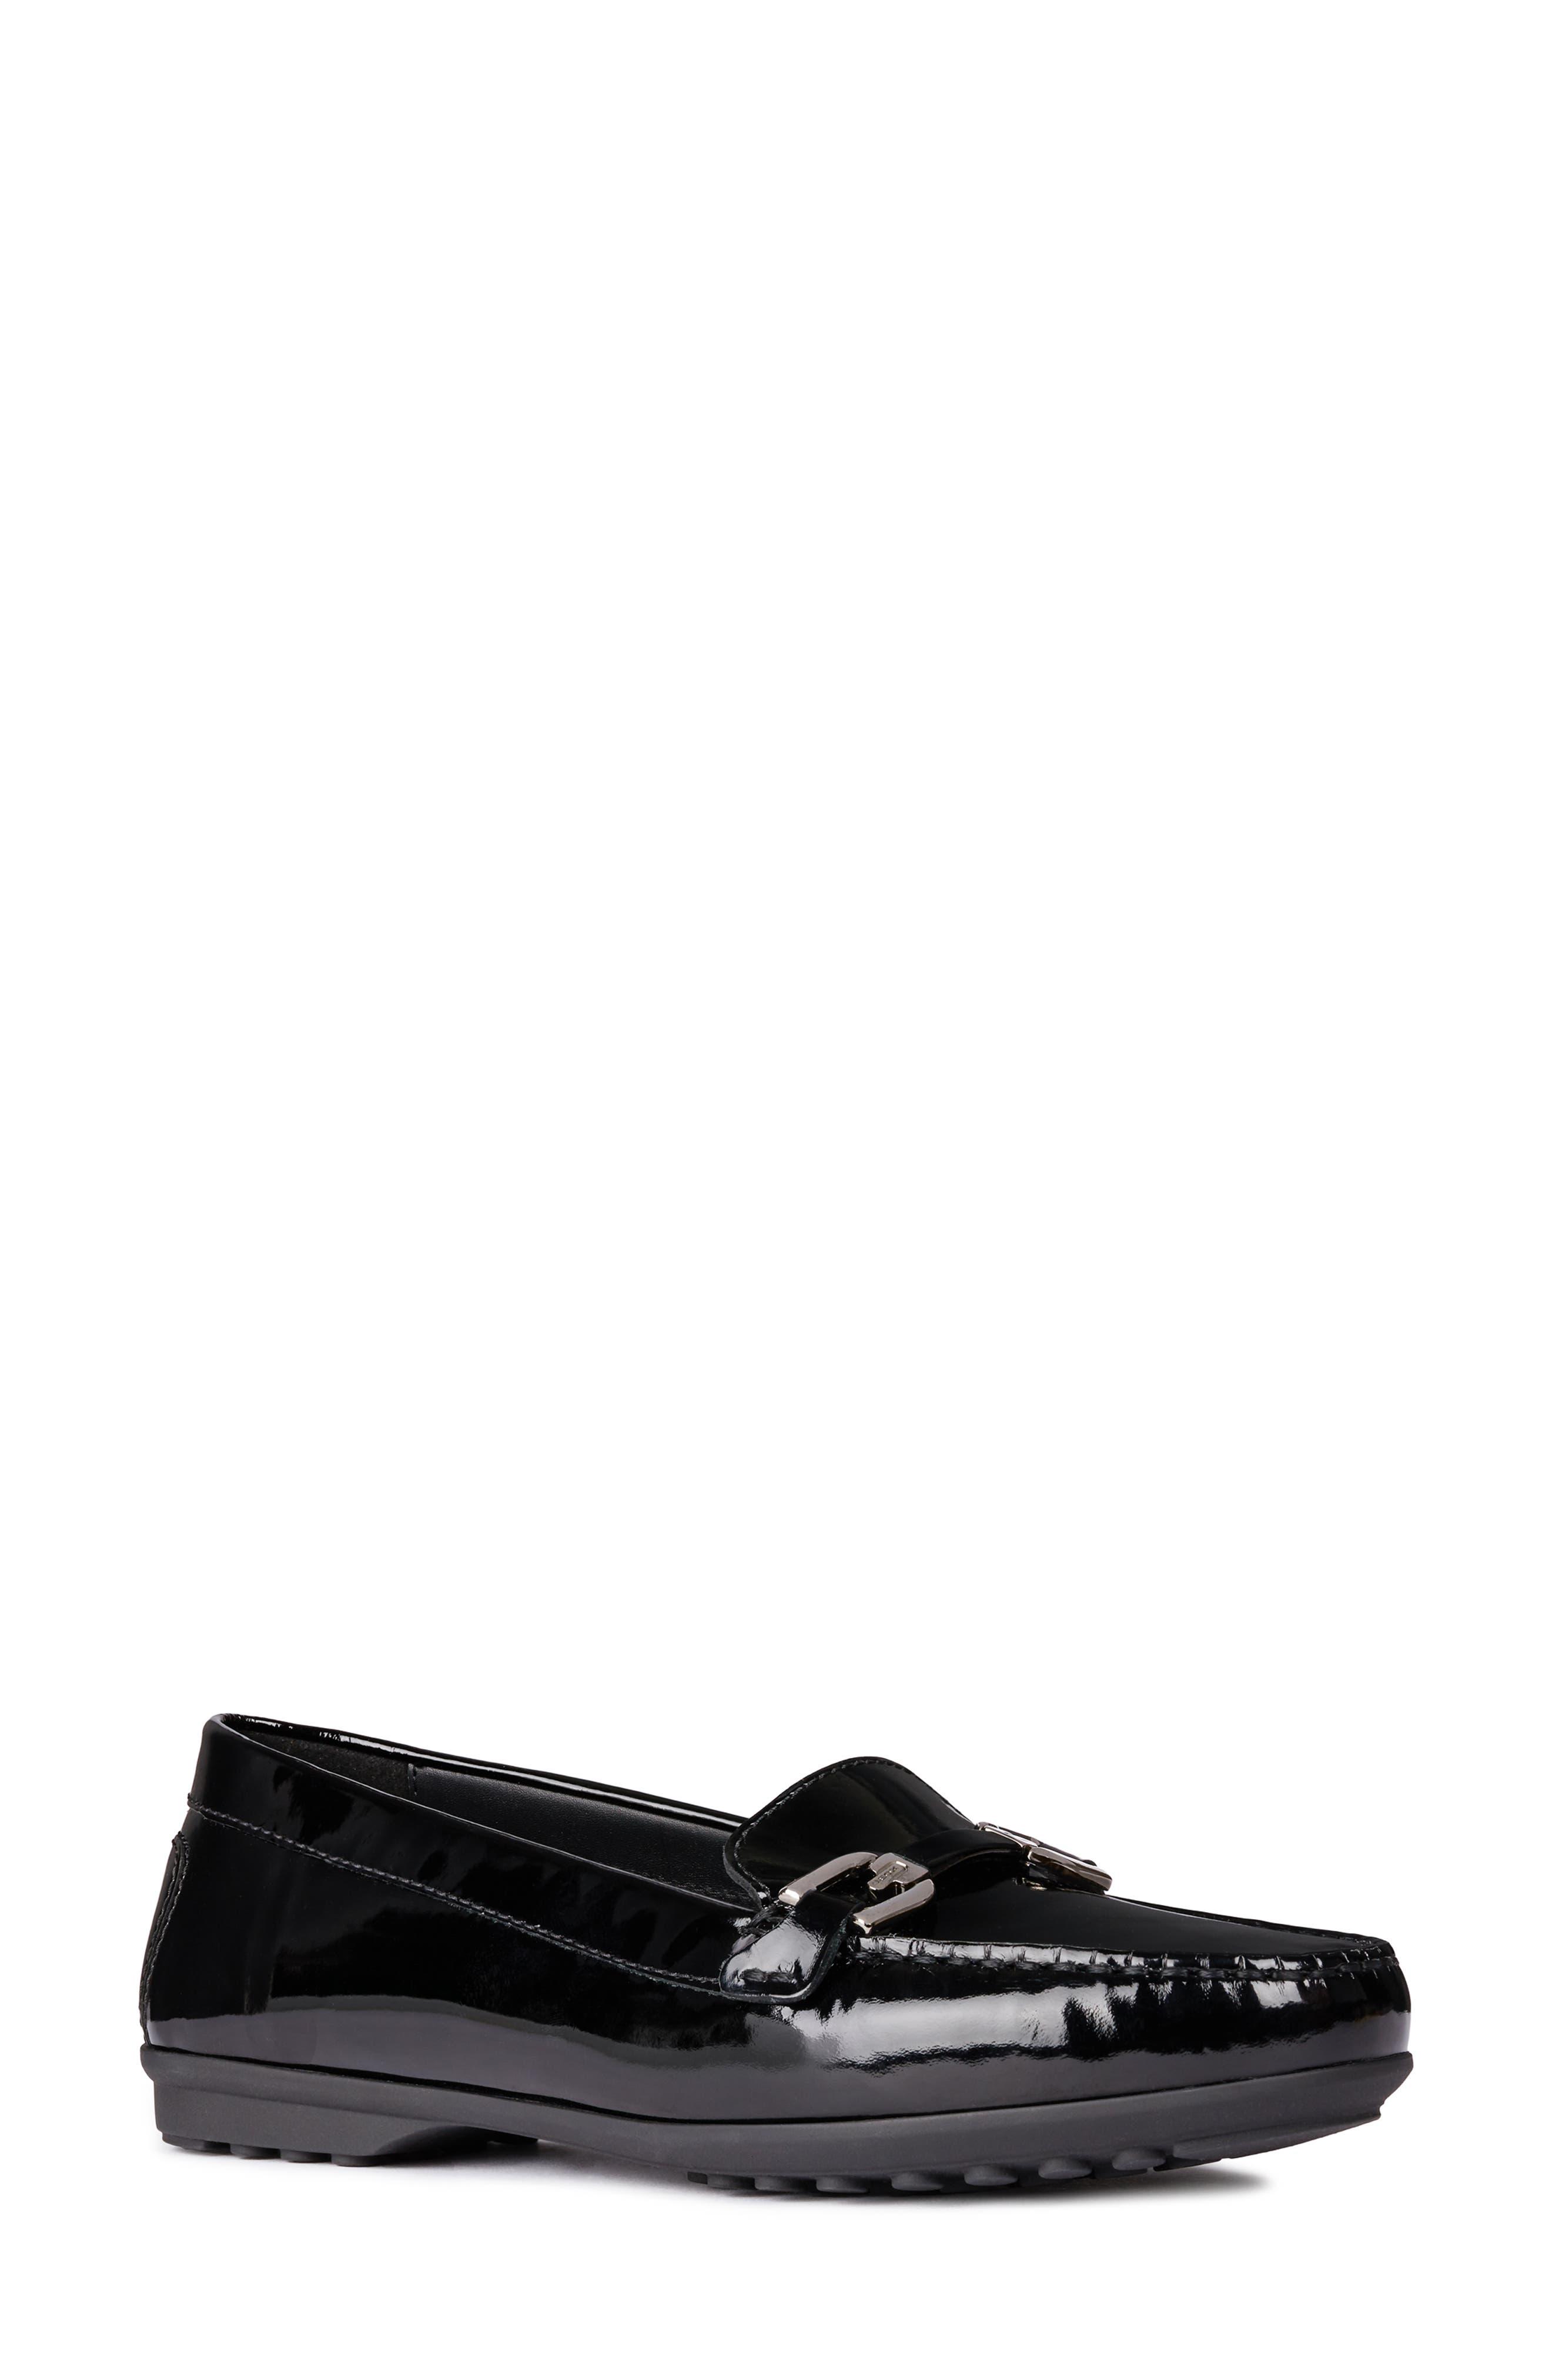 Alidia Loafer,                         Main,                         color, BLACK LEATHER